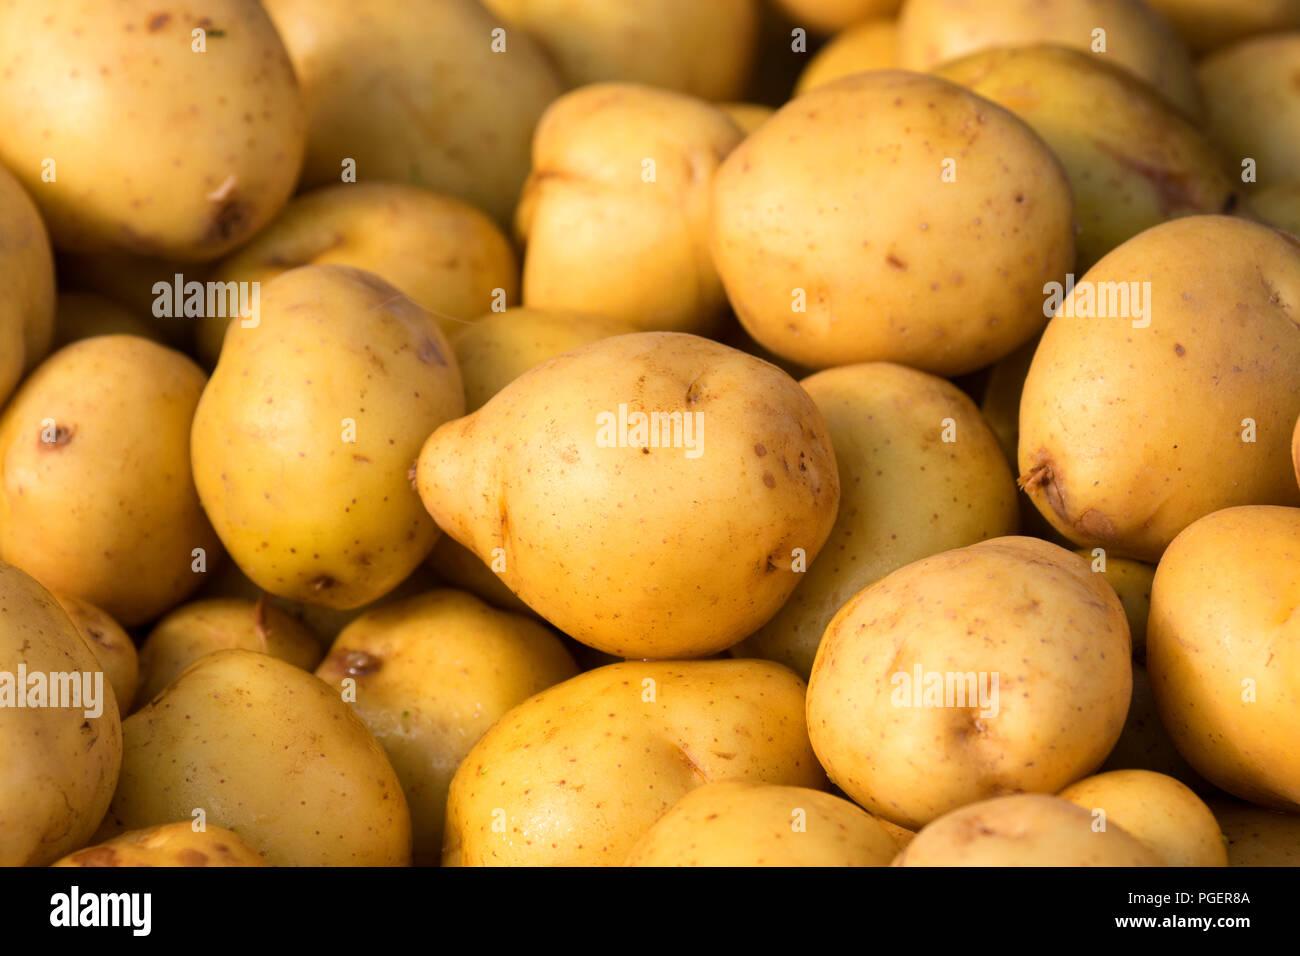 Yukon Gold potatoes, Salem Saturday Marker, Salem, Oregon - Stock Image